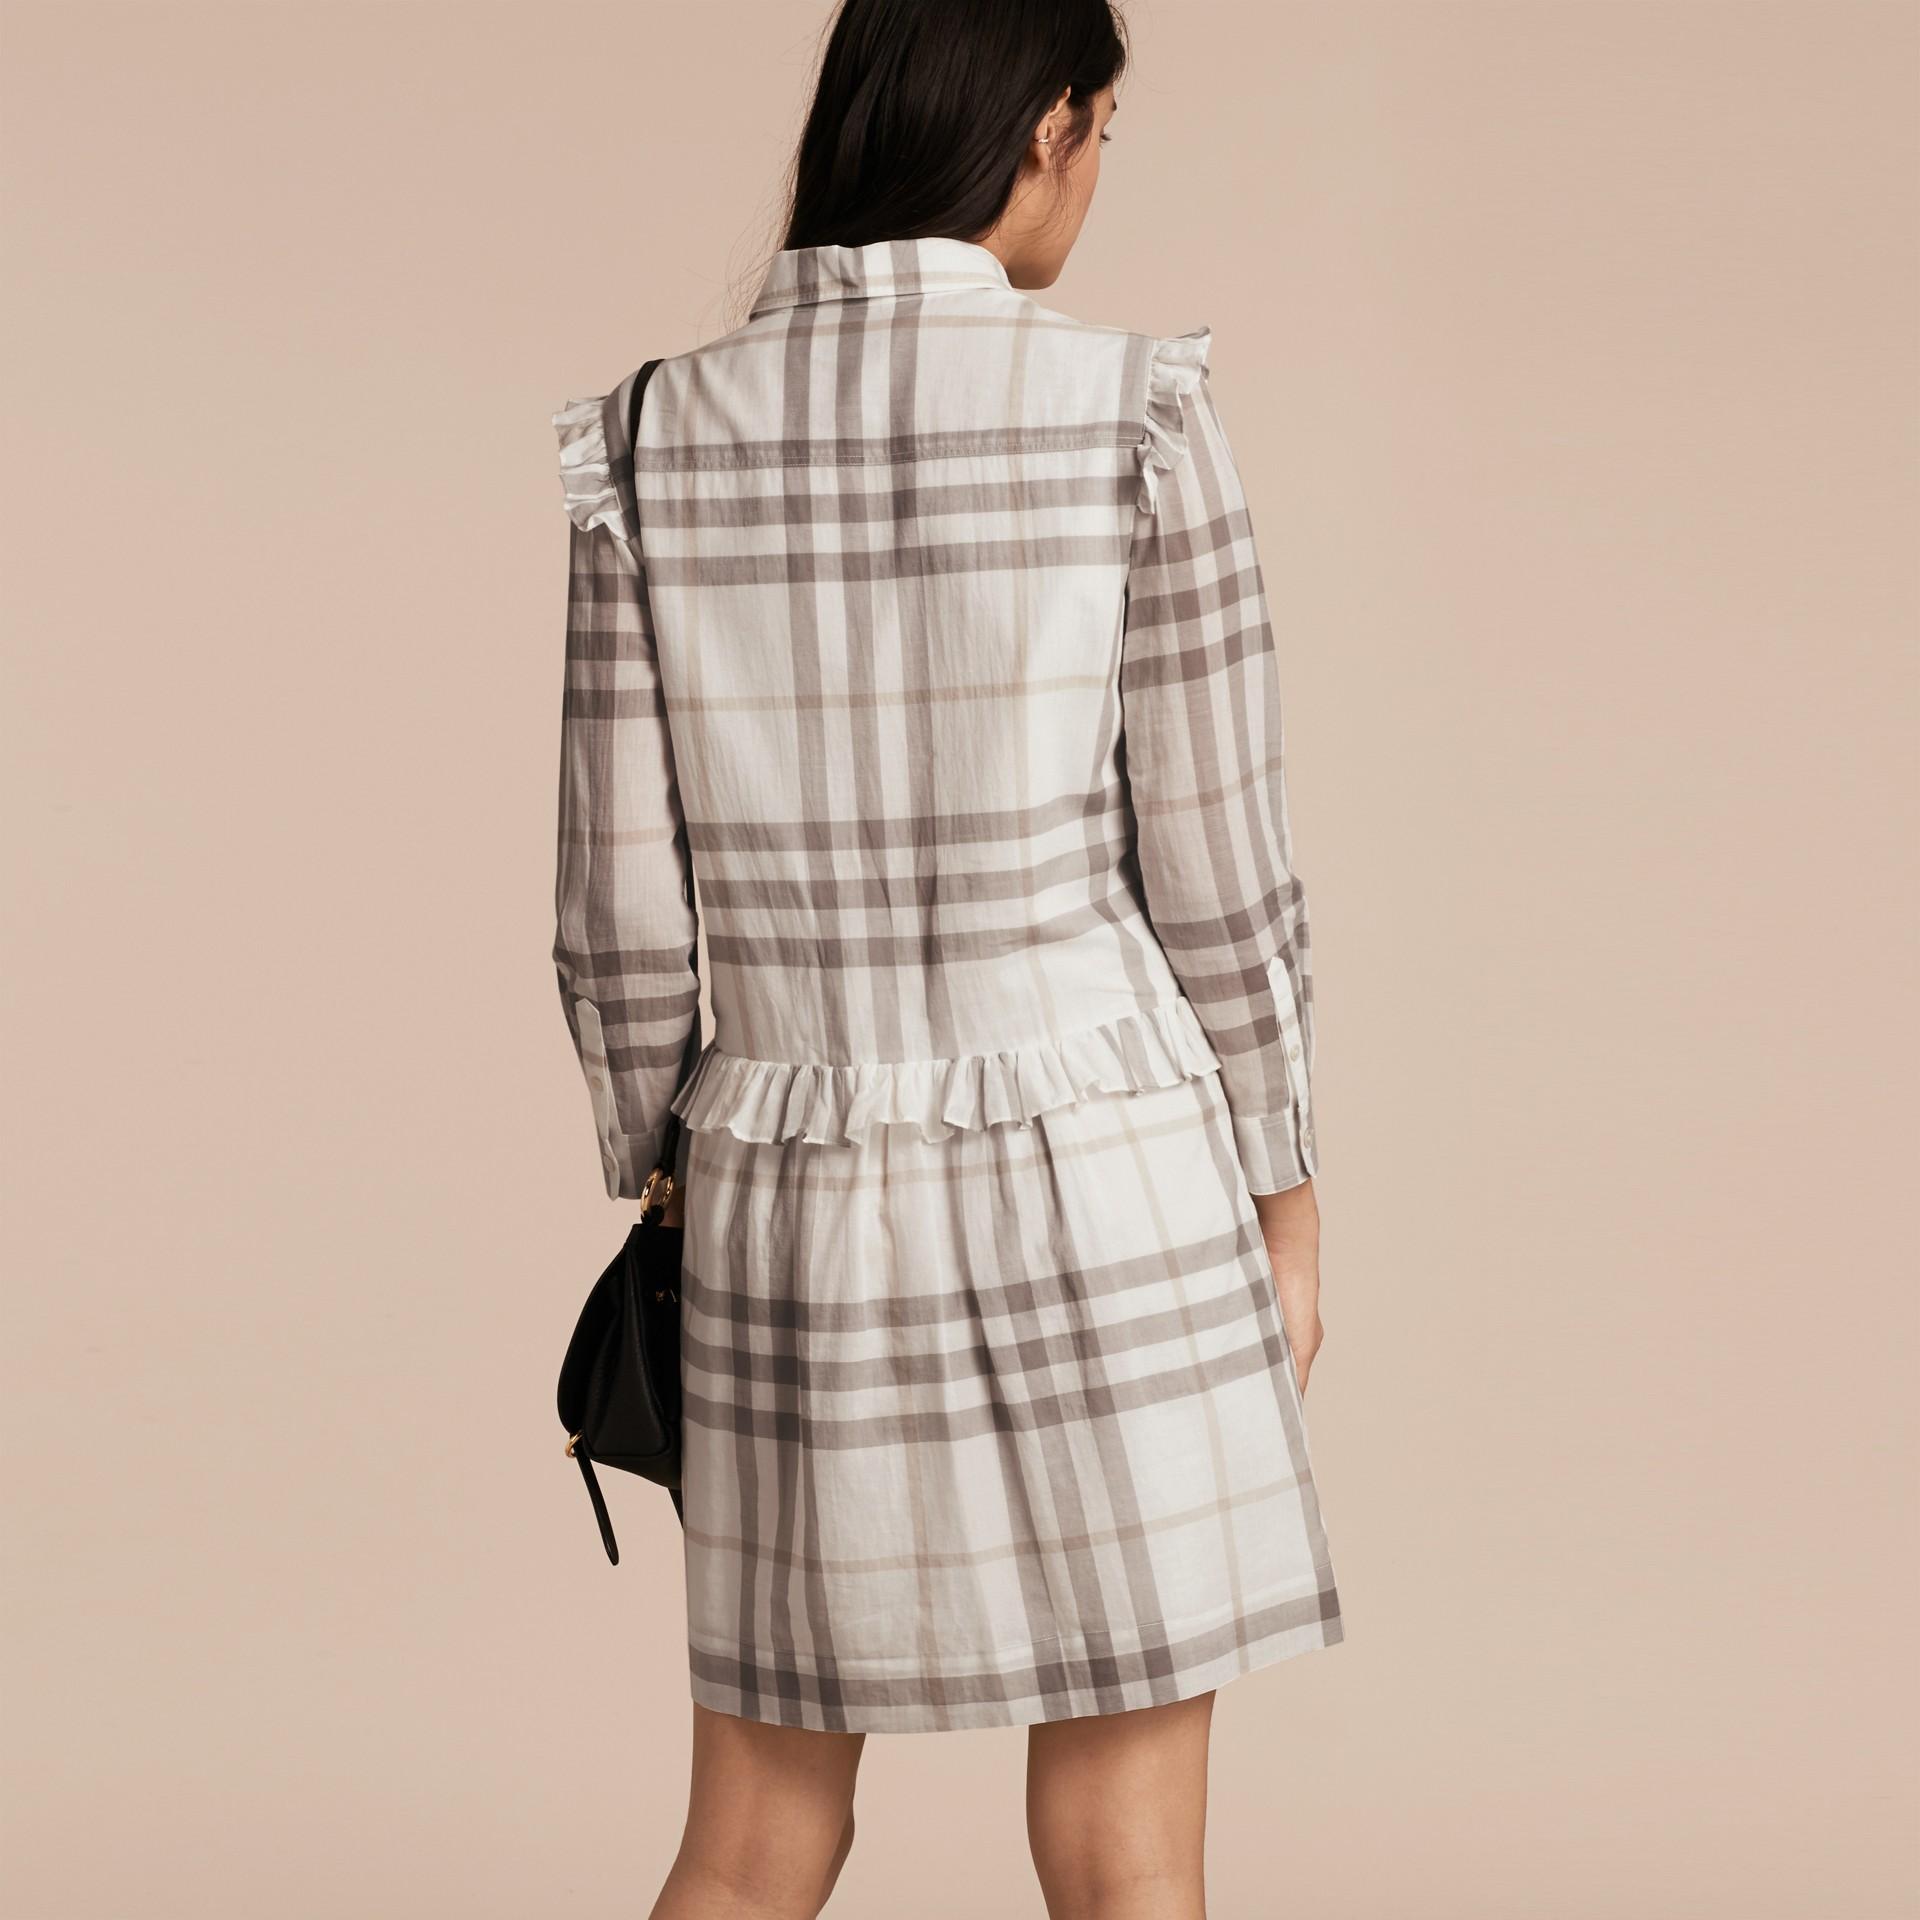 Ruffle Detail Cotton Check Shirt Dress Natural White - gallery image 3